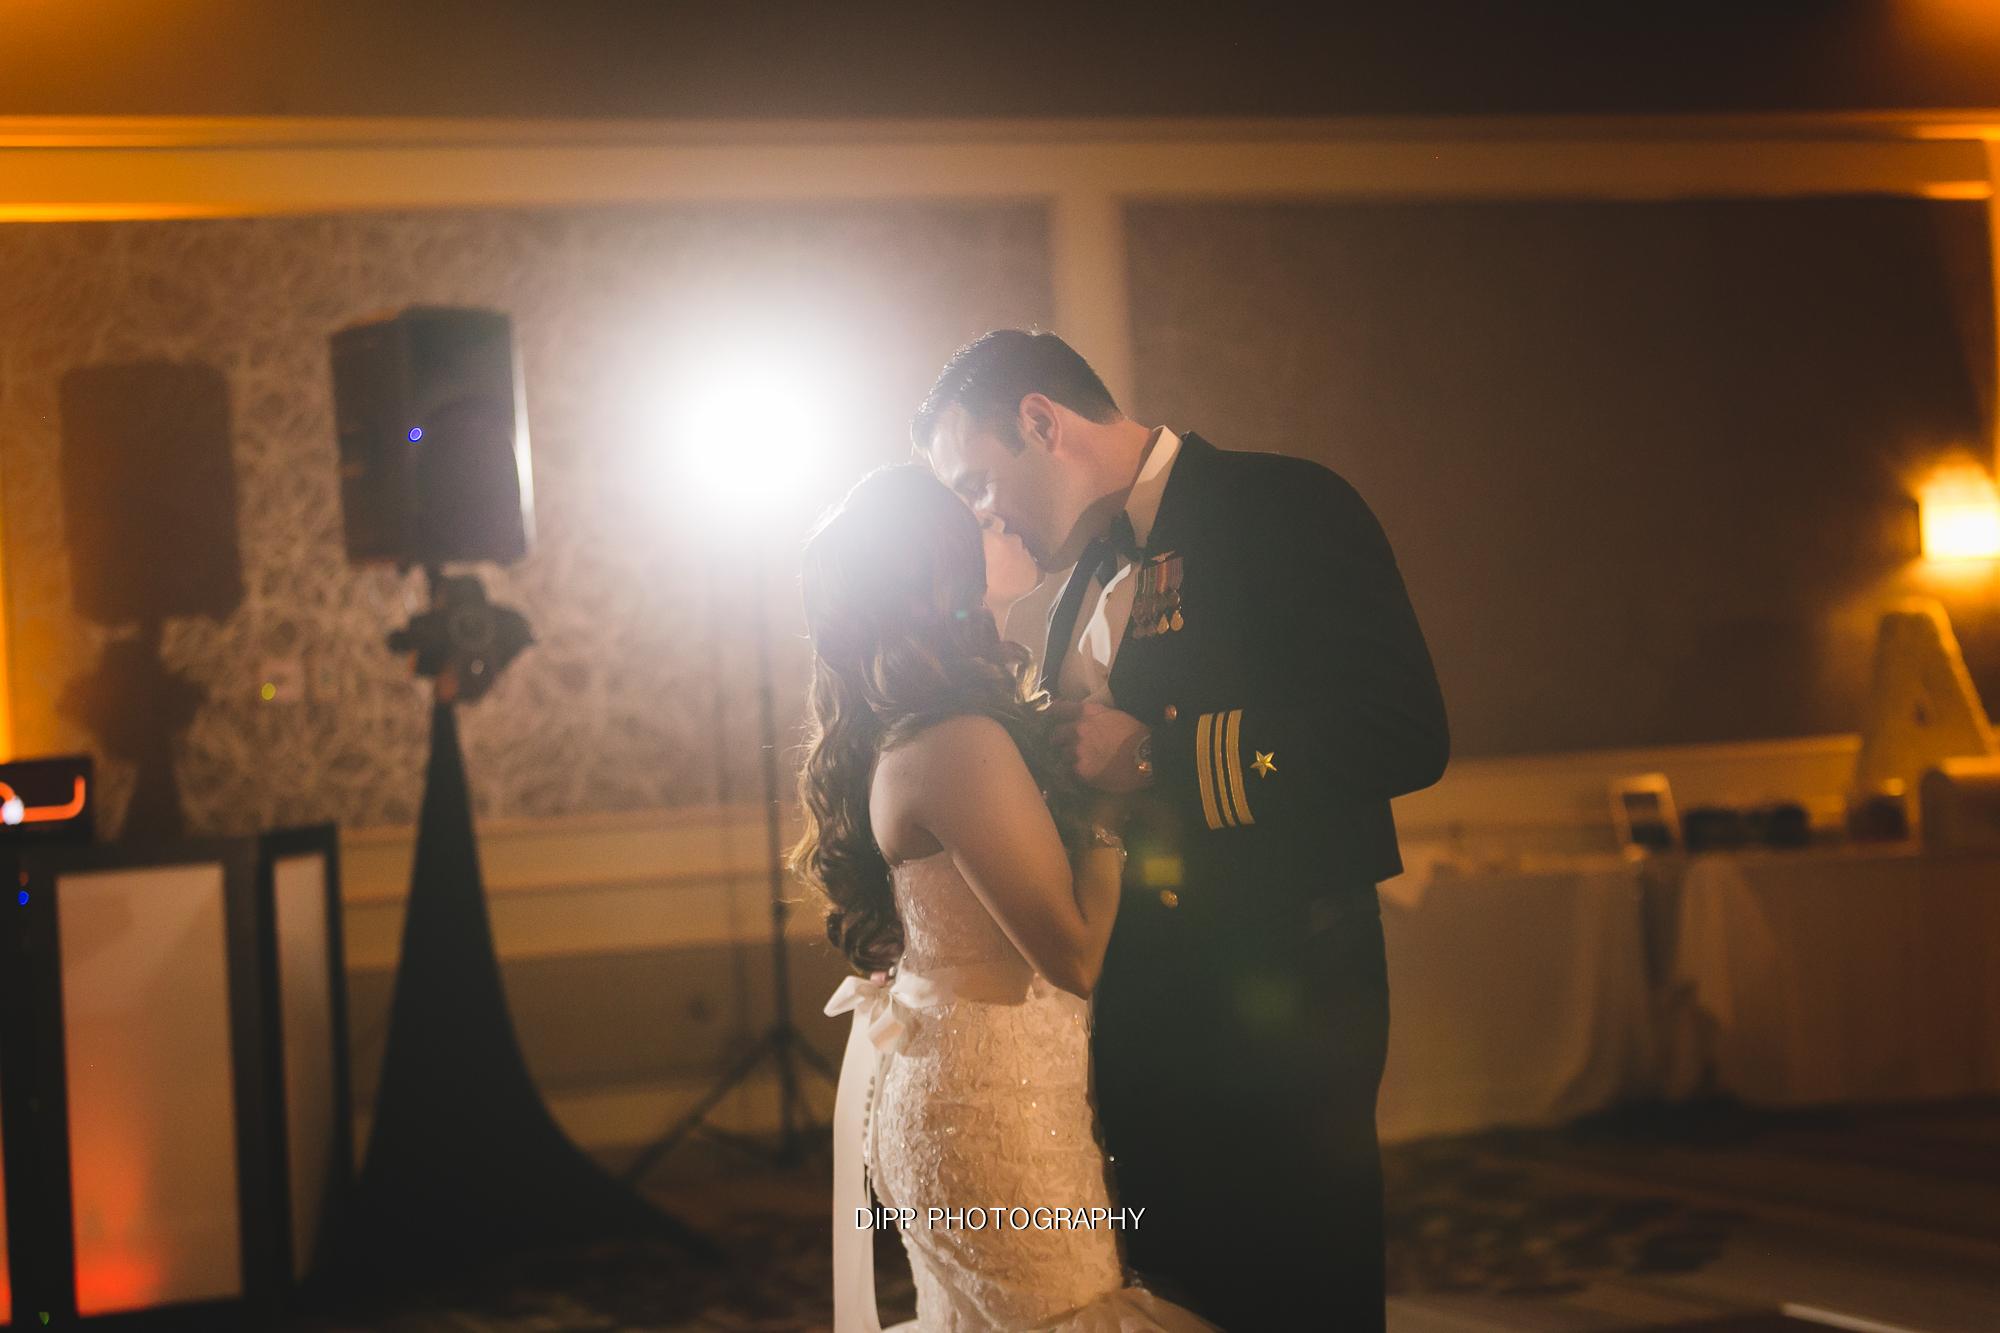 Dipp_2016 EDITED Sara & Brandon Wedding-421